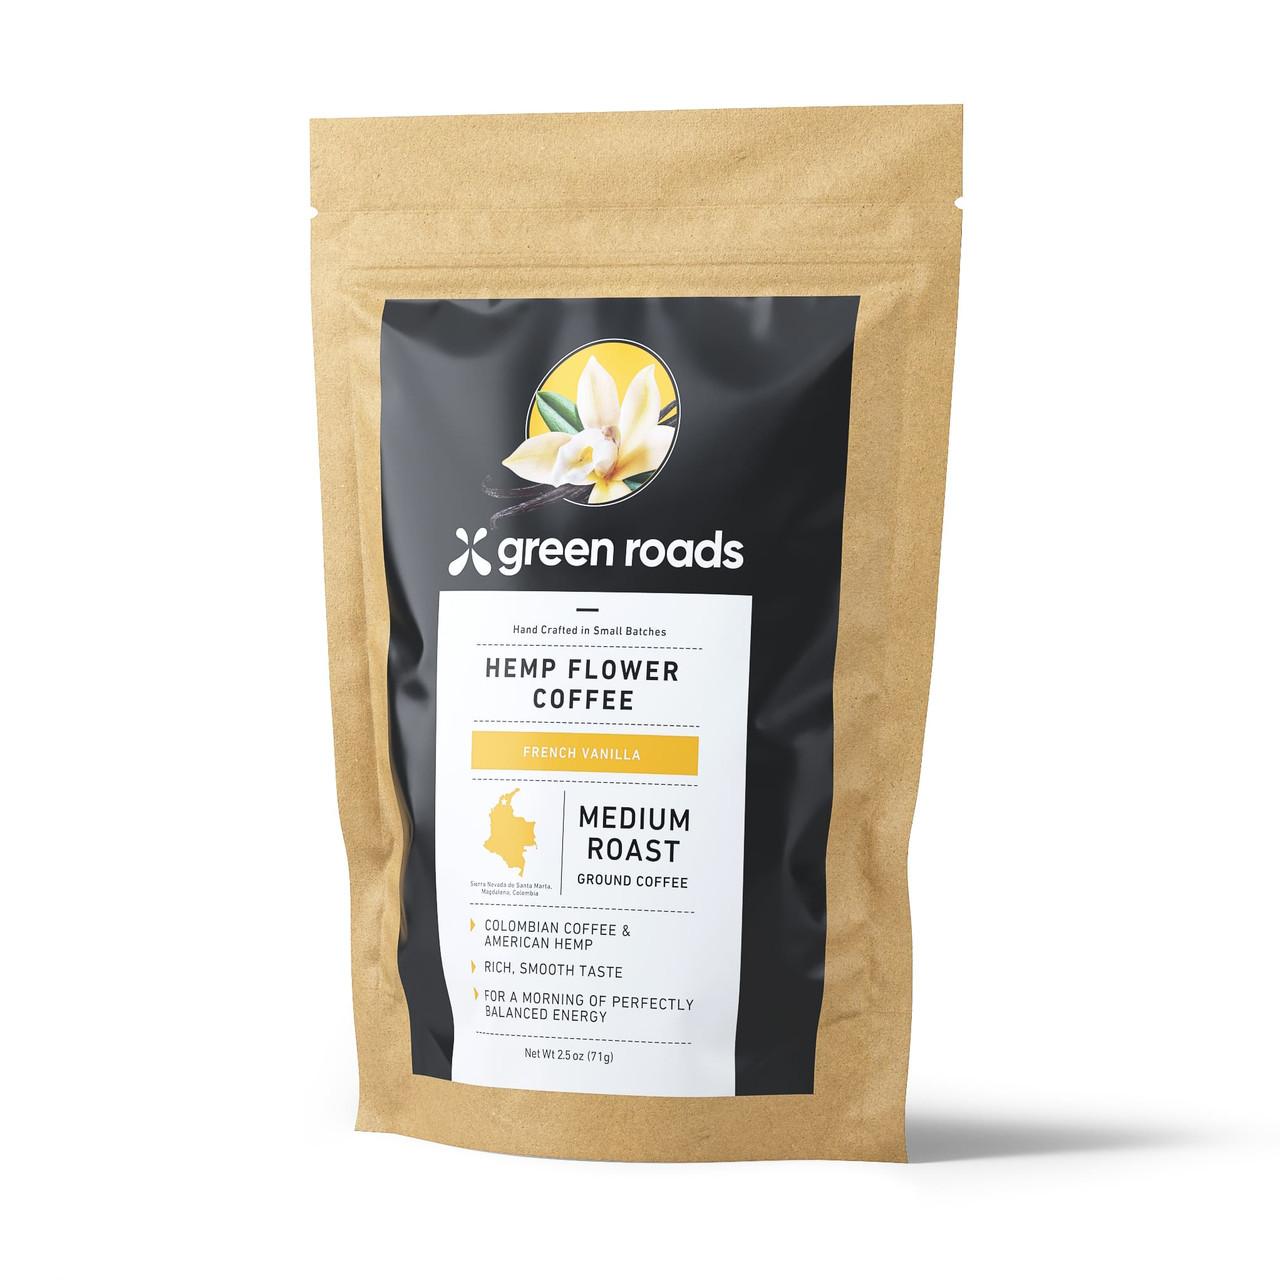 HEMP FLOWER COFFEE, FRENCH VANILLA - 2.5OZ